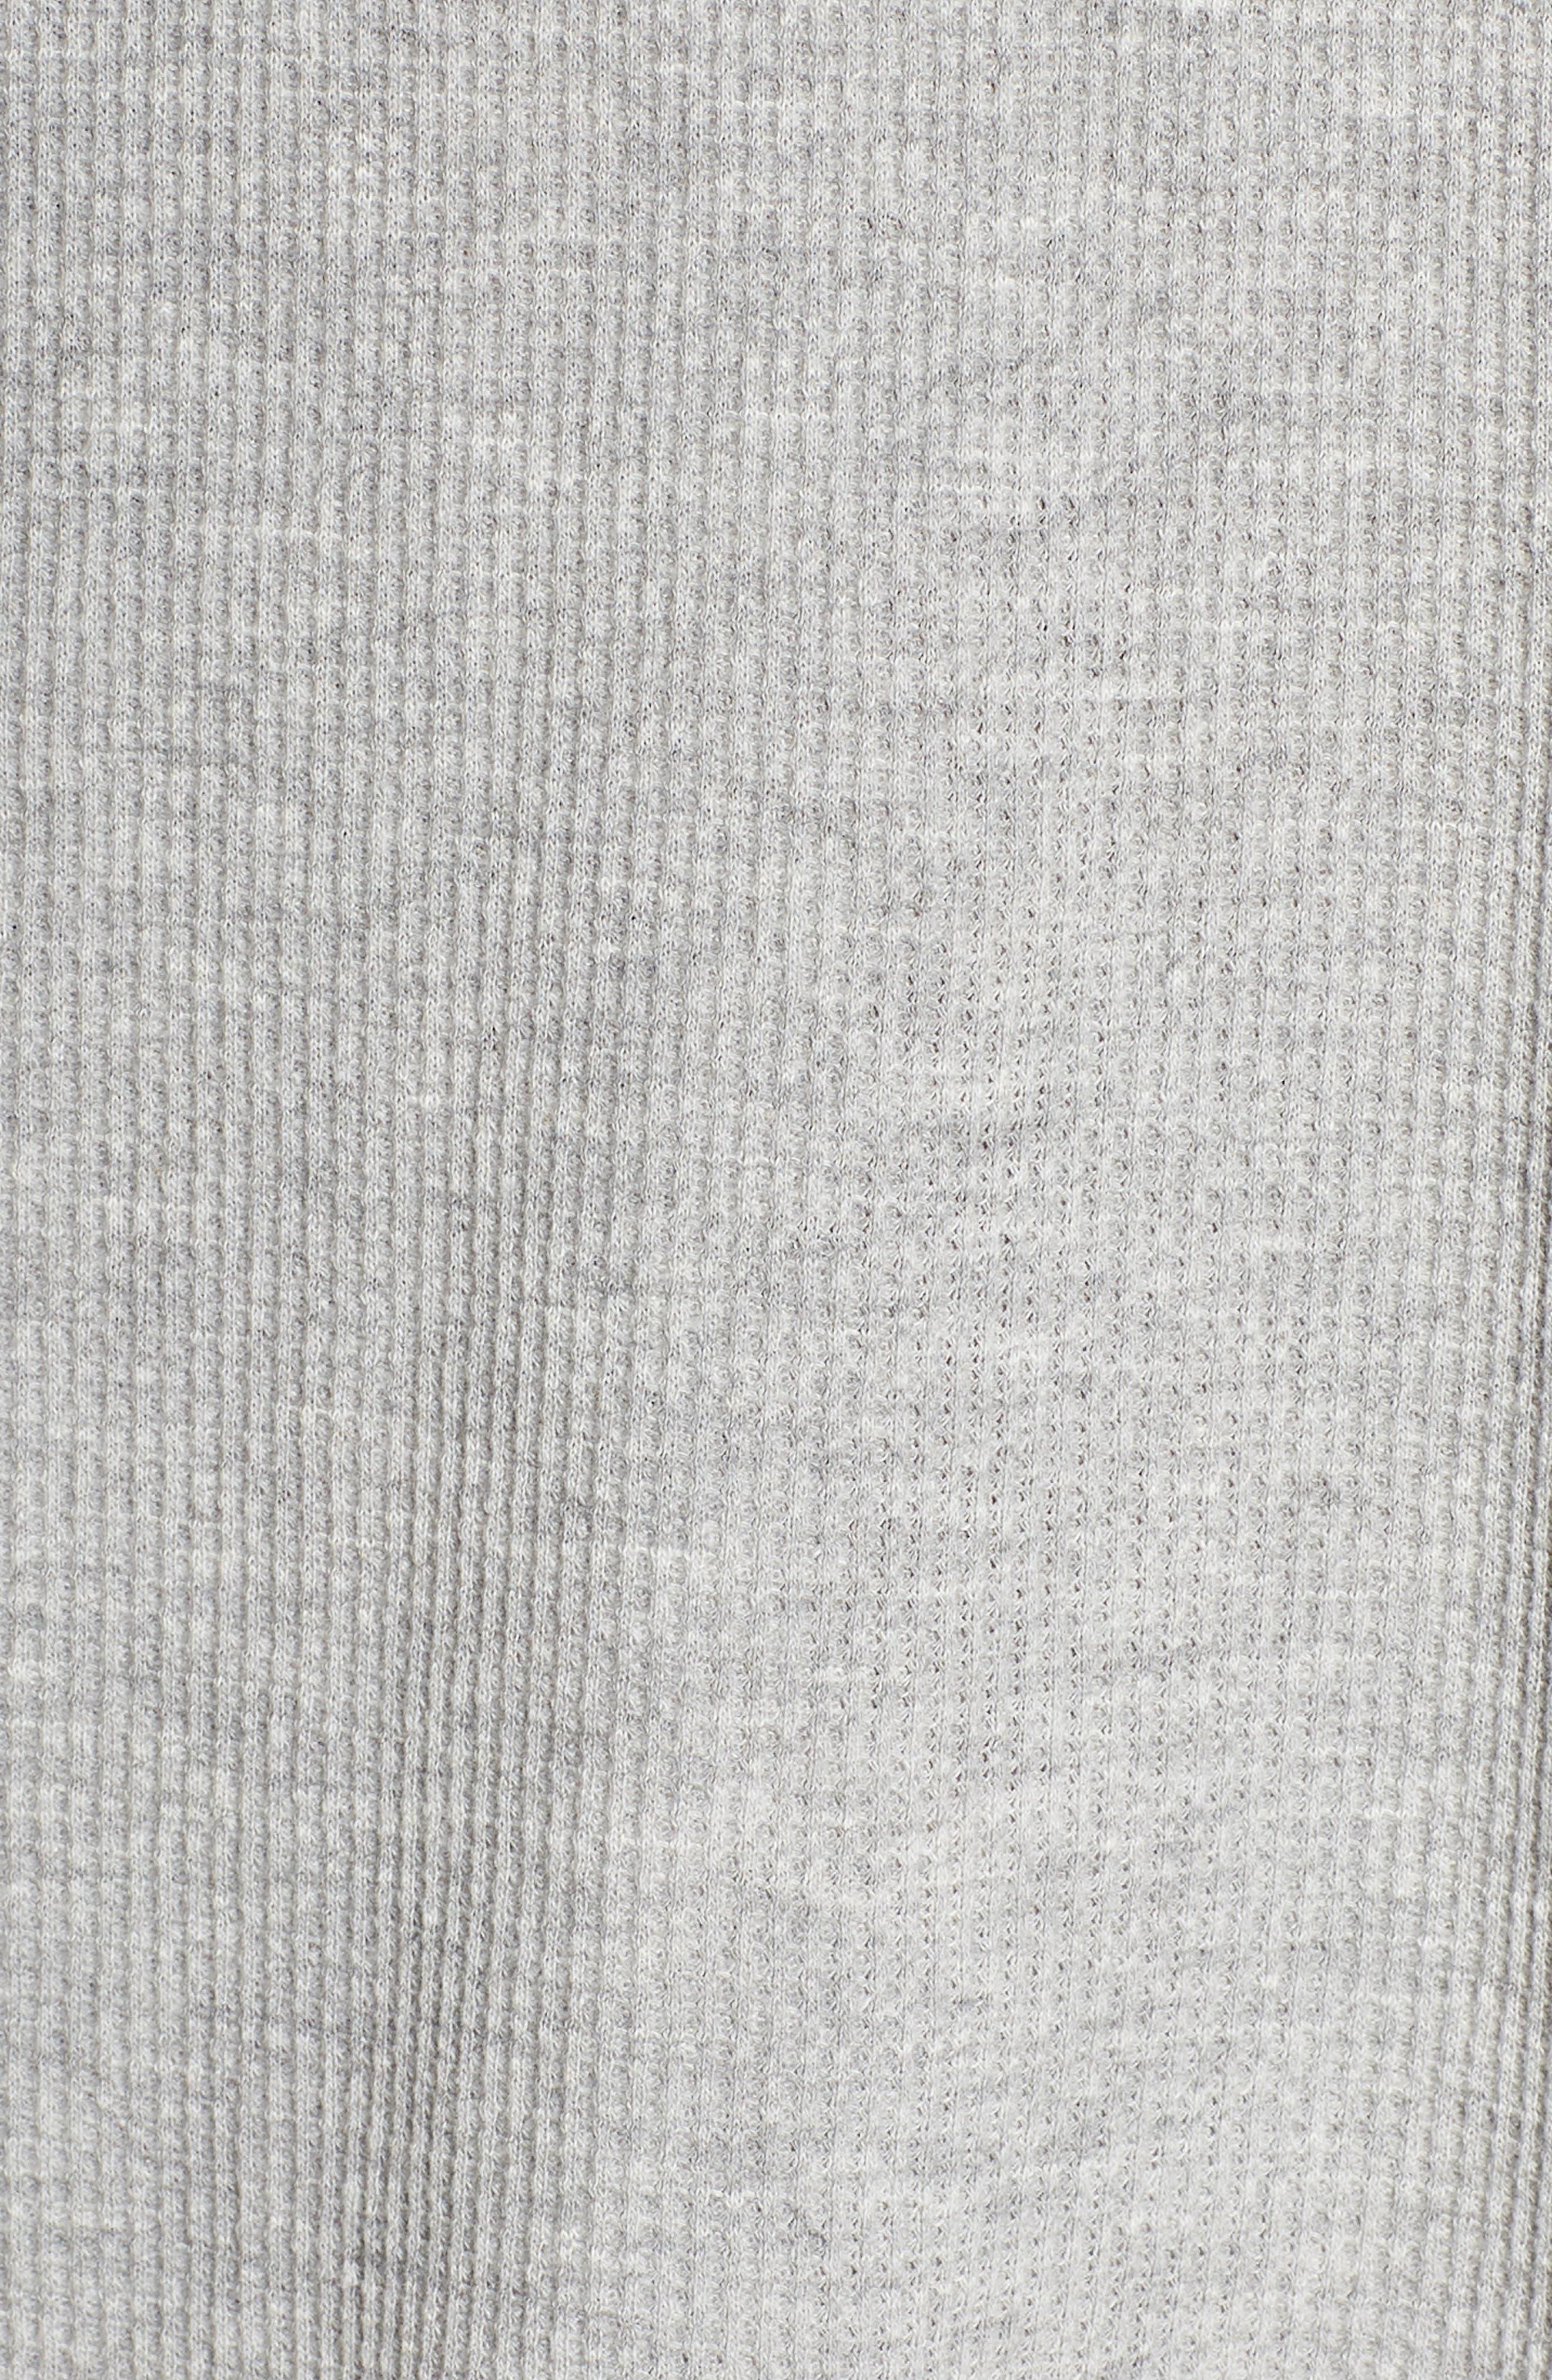 Elyse Lace-Up Waffle Knit Sleep Top,                             Alternate thumbnail 5, color,                             020